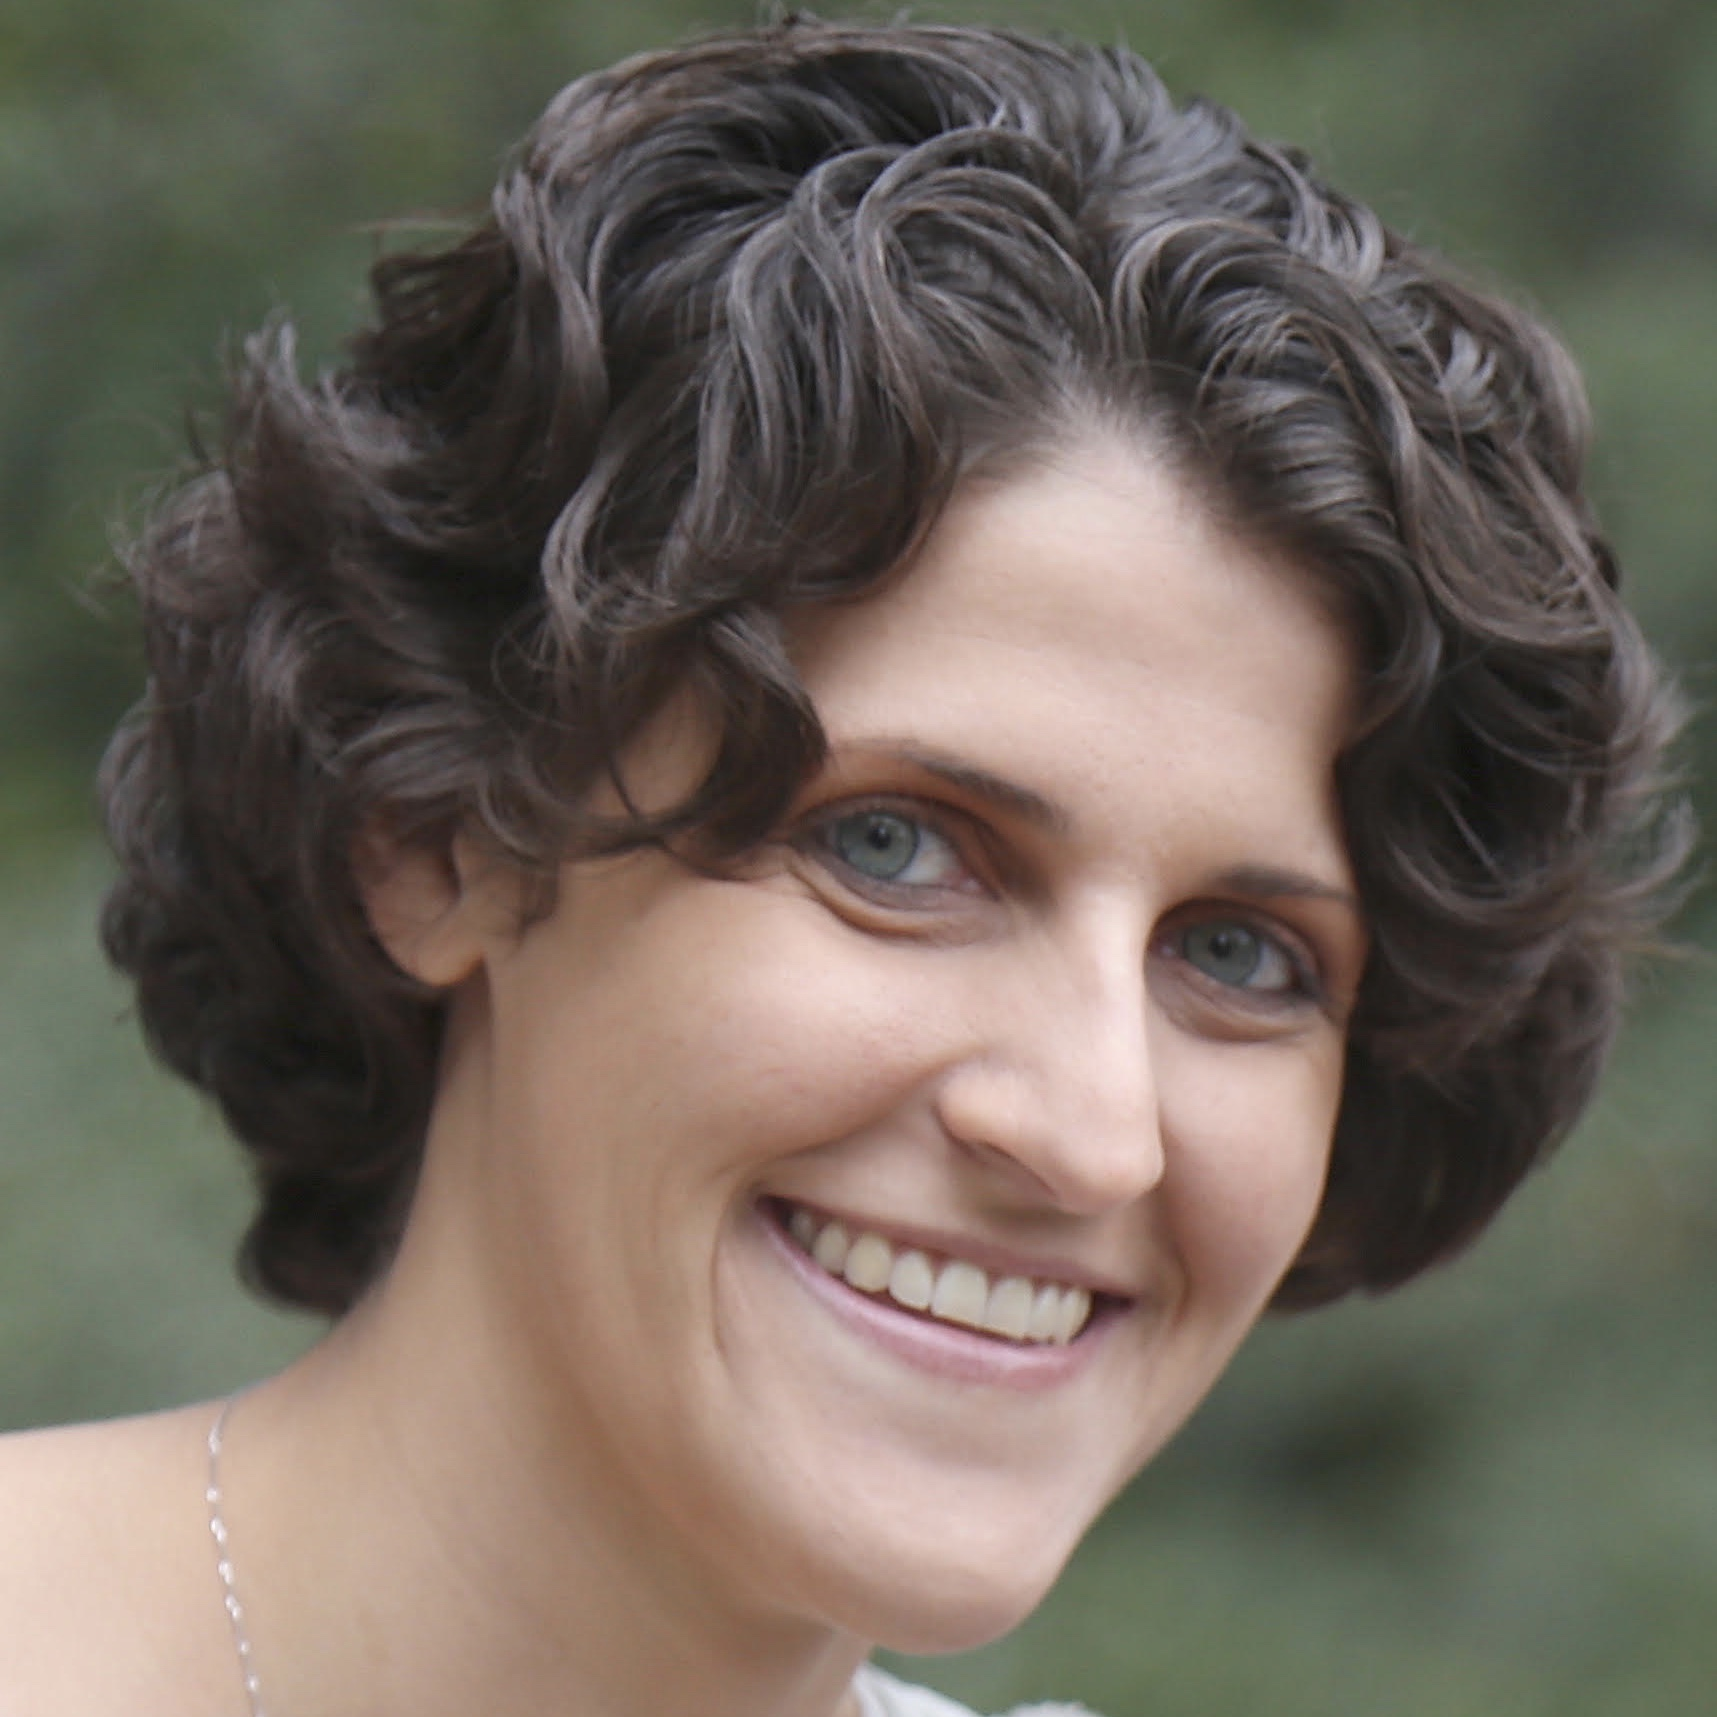 Samantha Grill